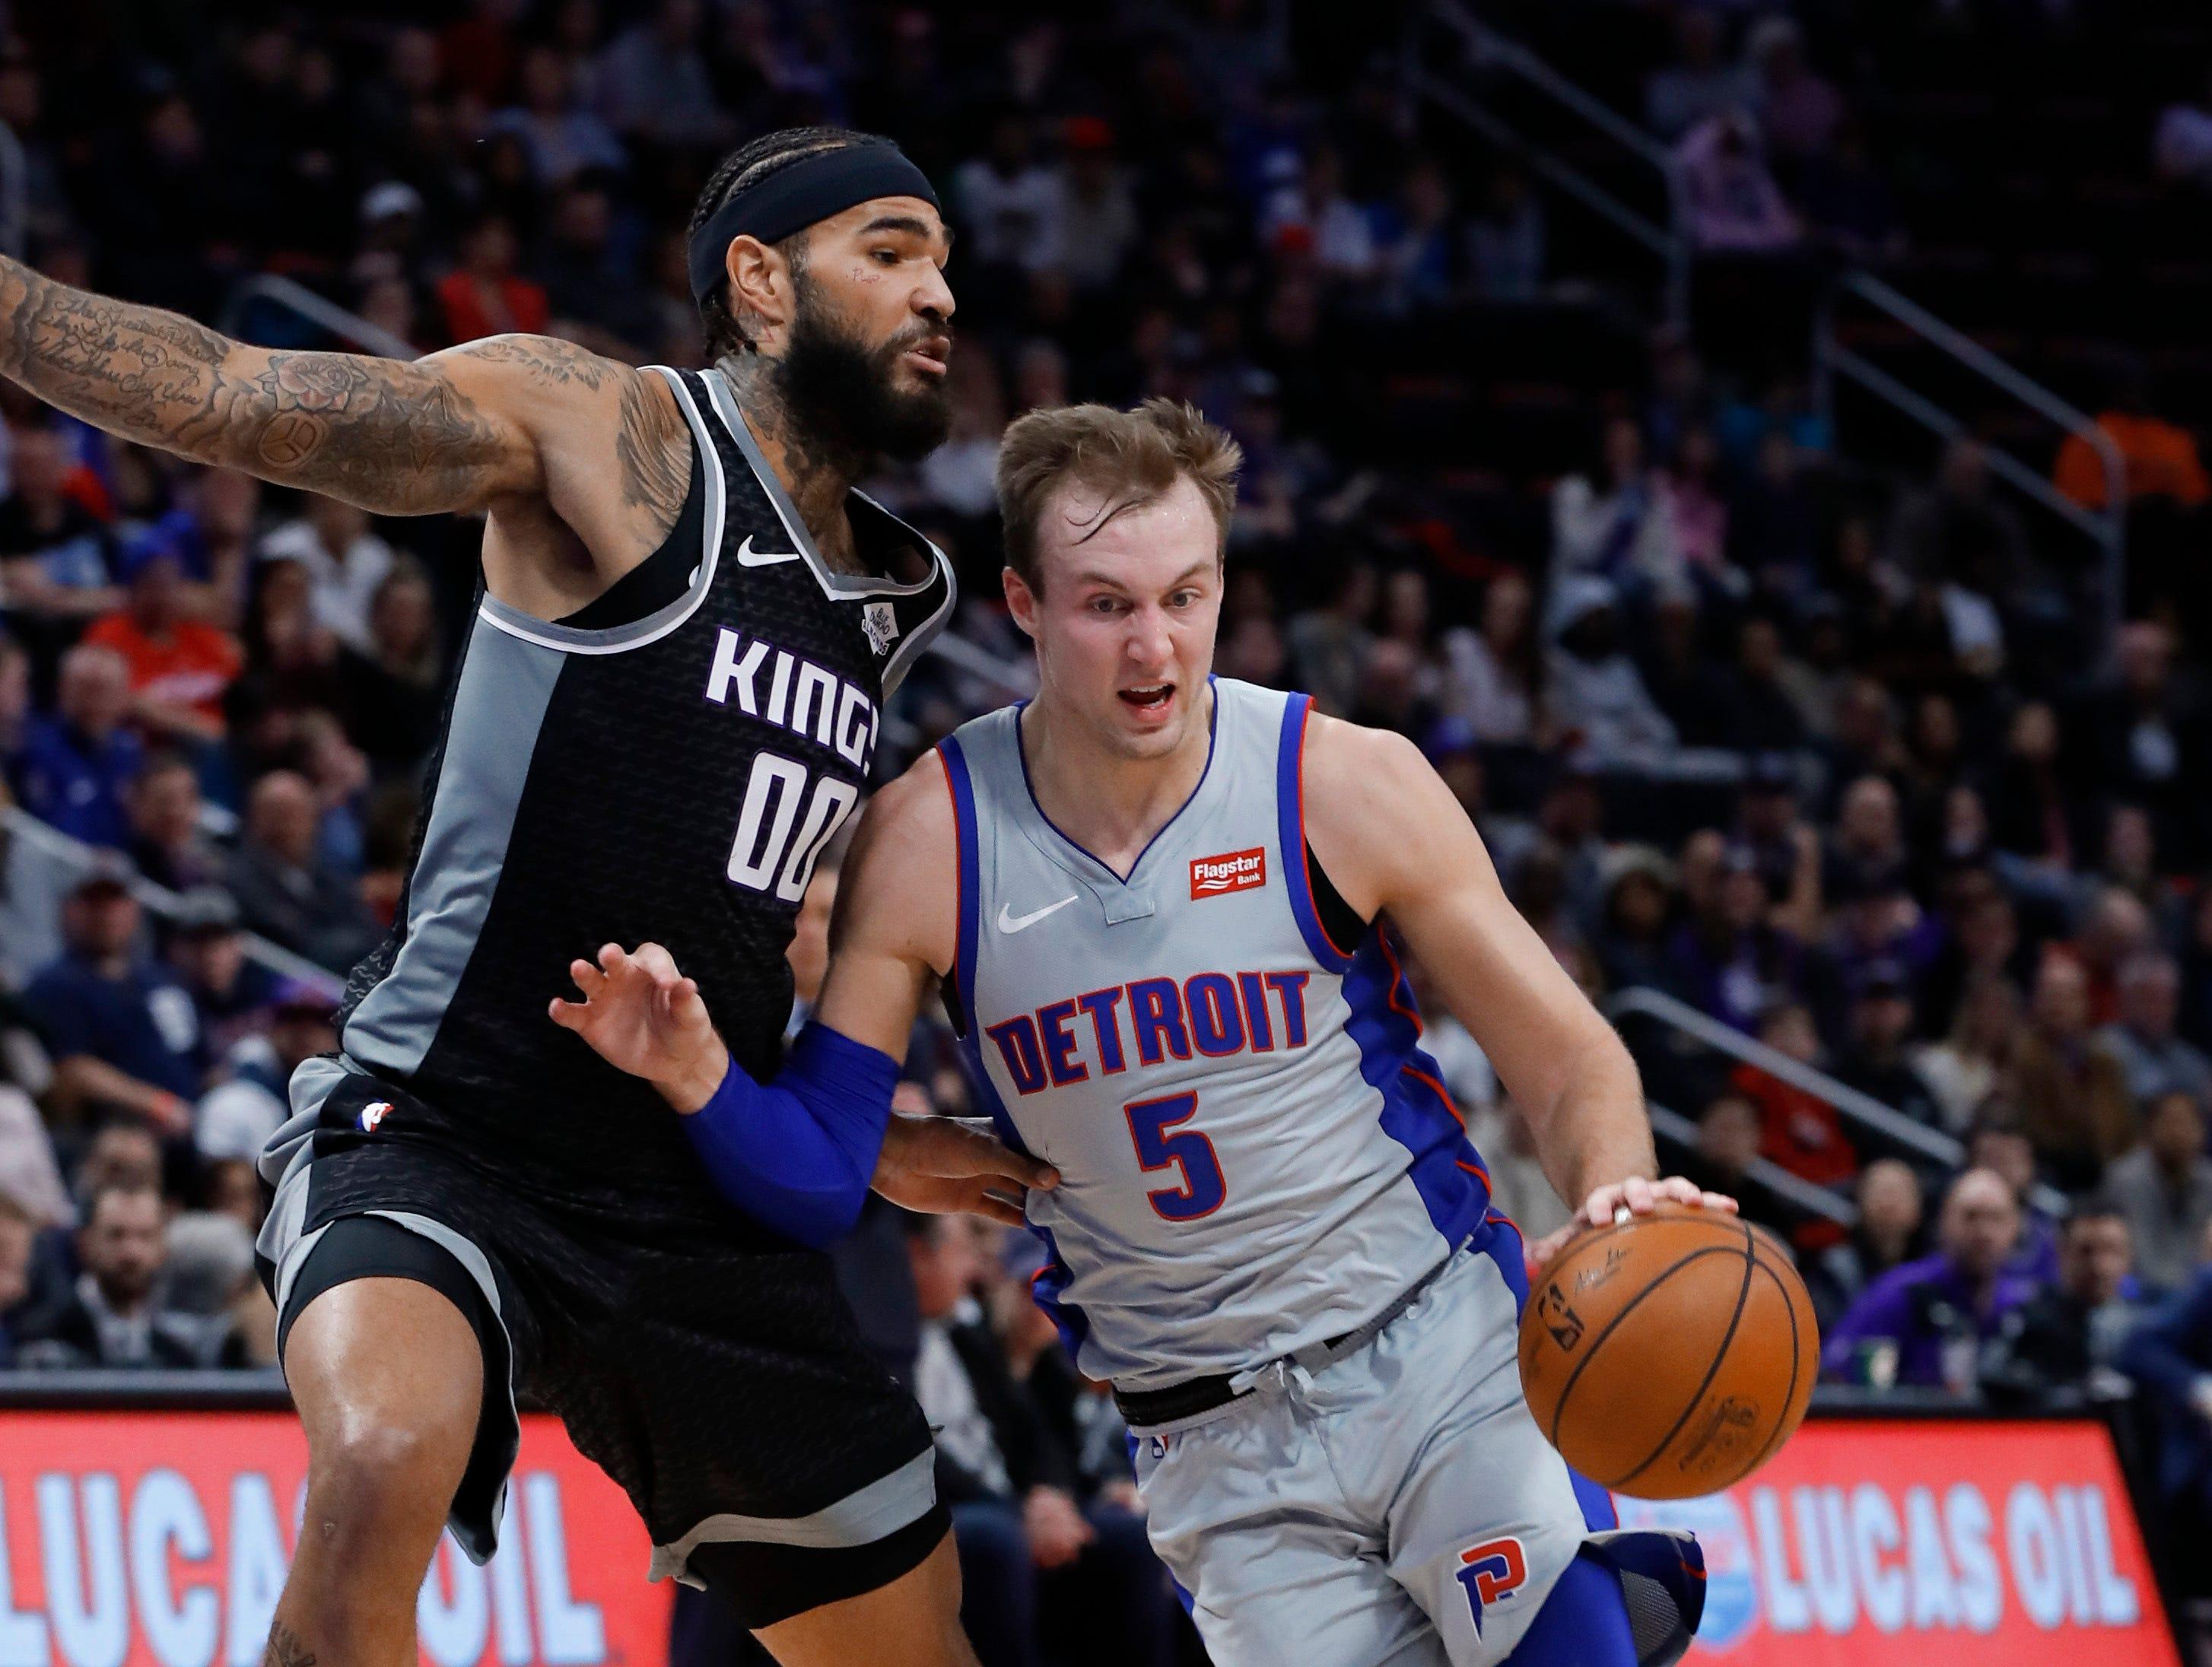 Detroit Pistons guard Luke Kennard (5) drives on Sacramento Kings center Willie Cauley-Stein (00) during the first half of an NBA basketball game in Detroit, Saturday, Jan. 19, 2019.